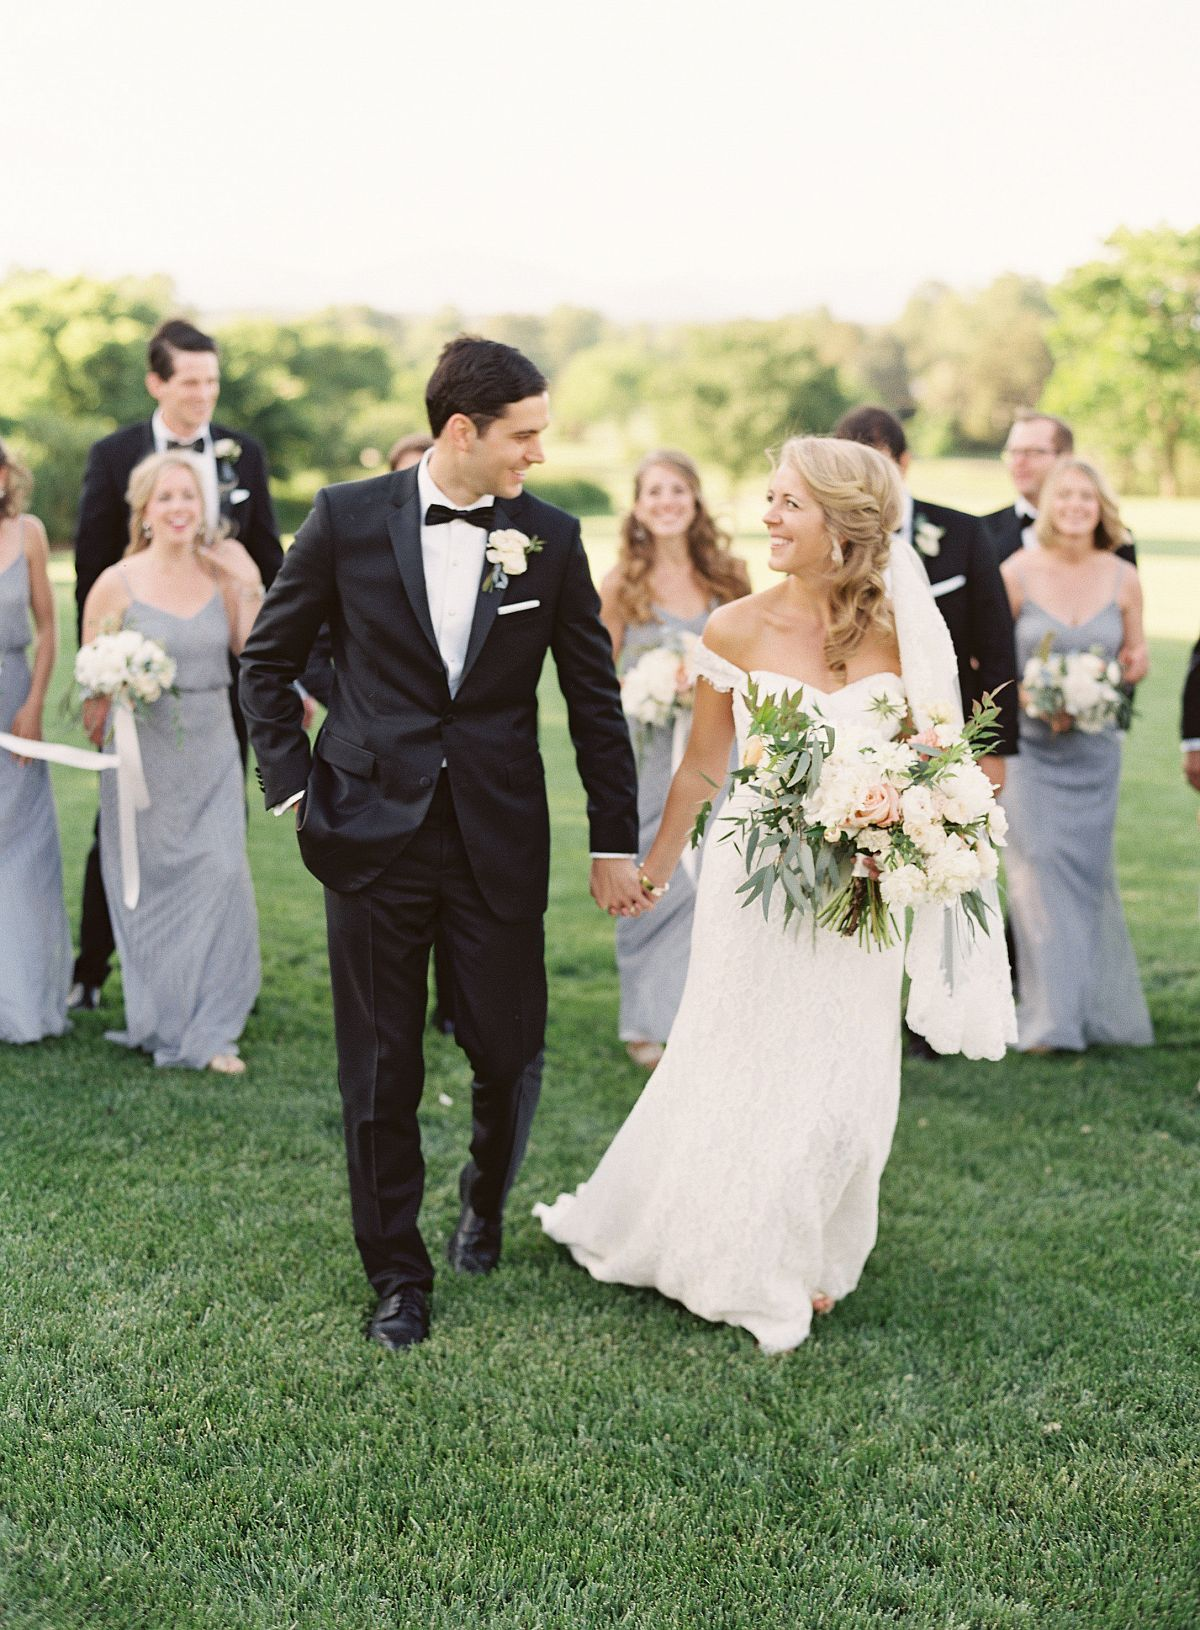 Bluegrey bridesmaids and black tuxes wedding planning pinterest